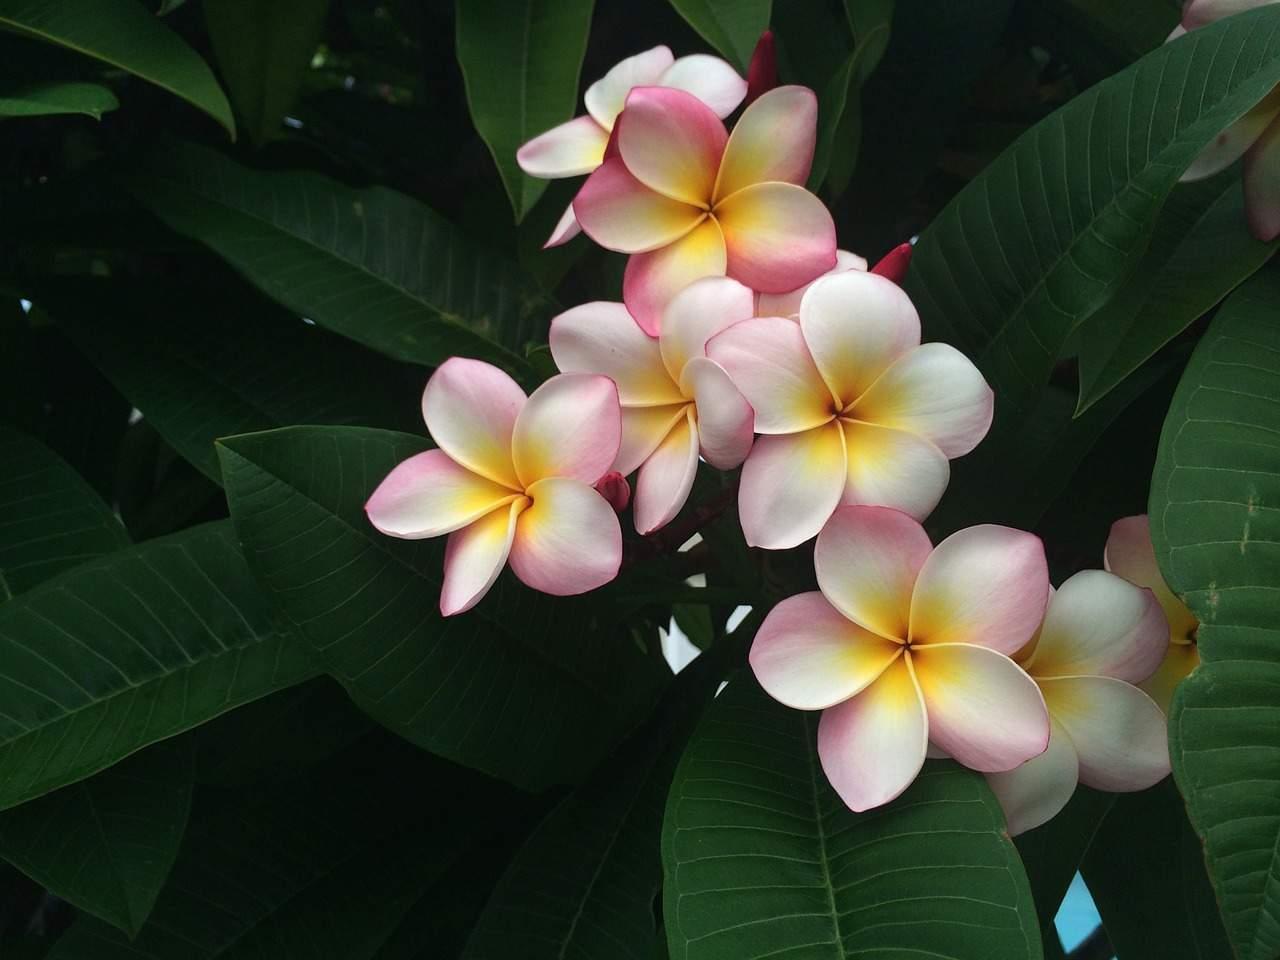 mit dem hawaiianischen vergebungsritual Ho'oponopono verzeihen lernen